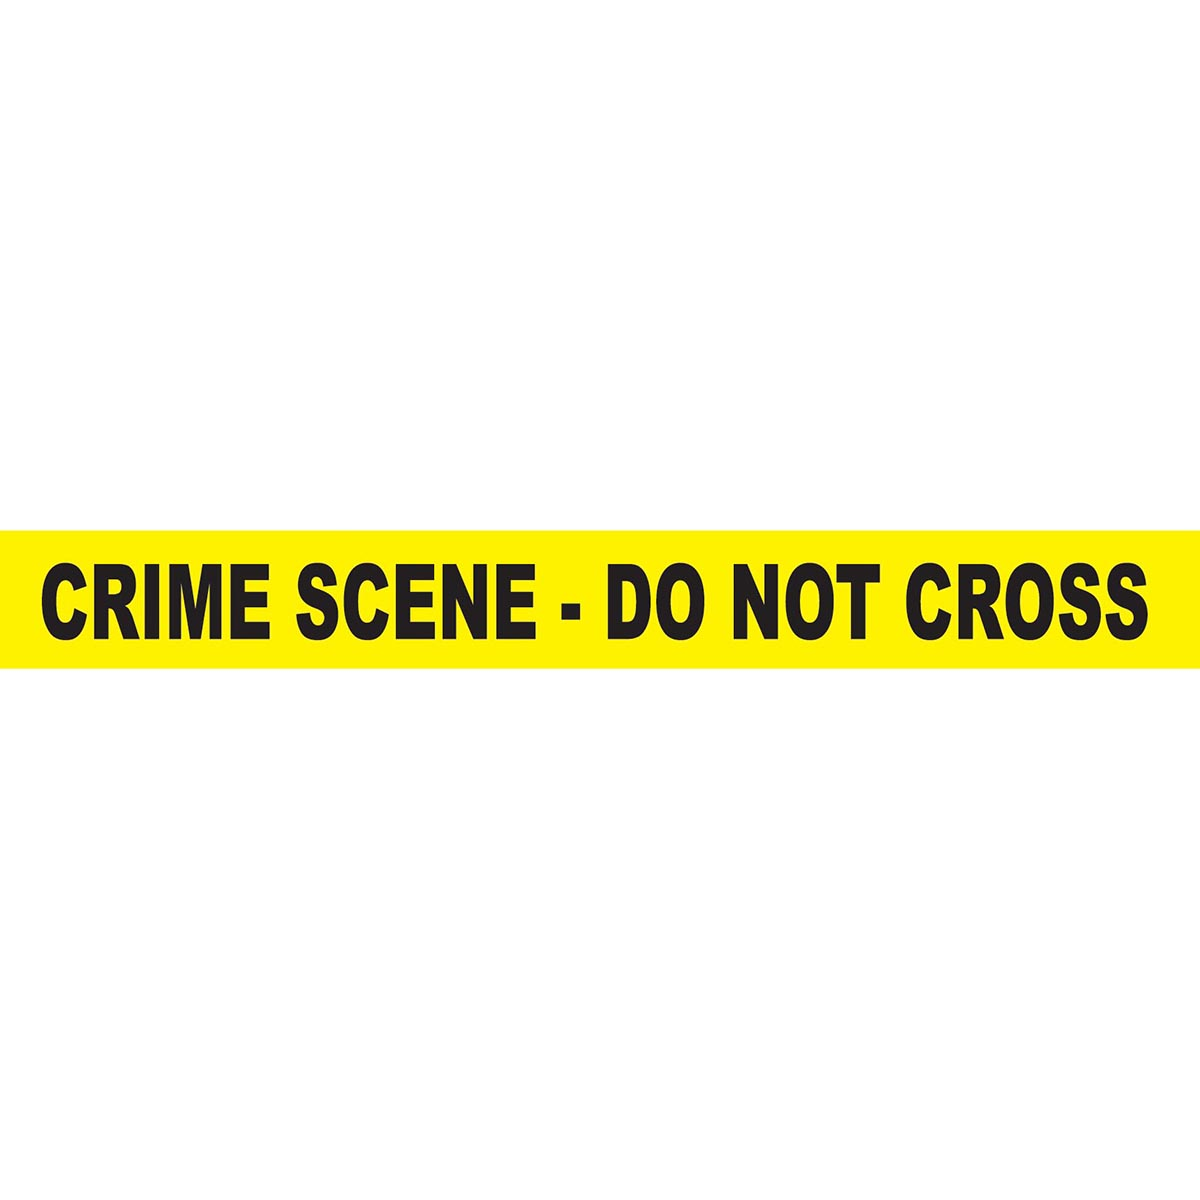 Geek clipart tape Art Free Crime Geek on